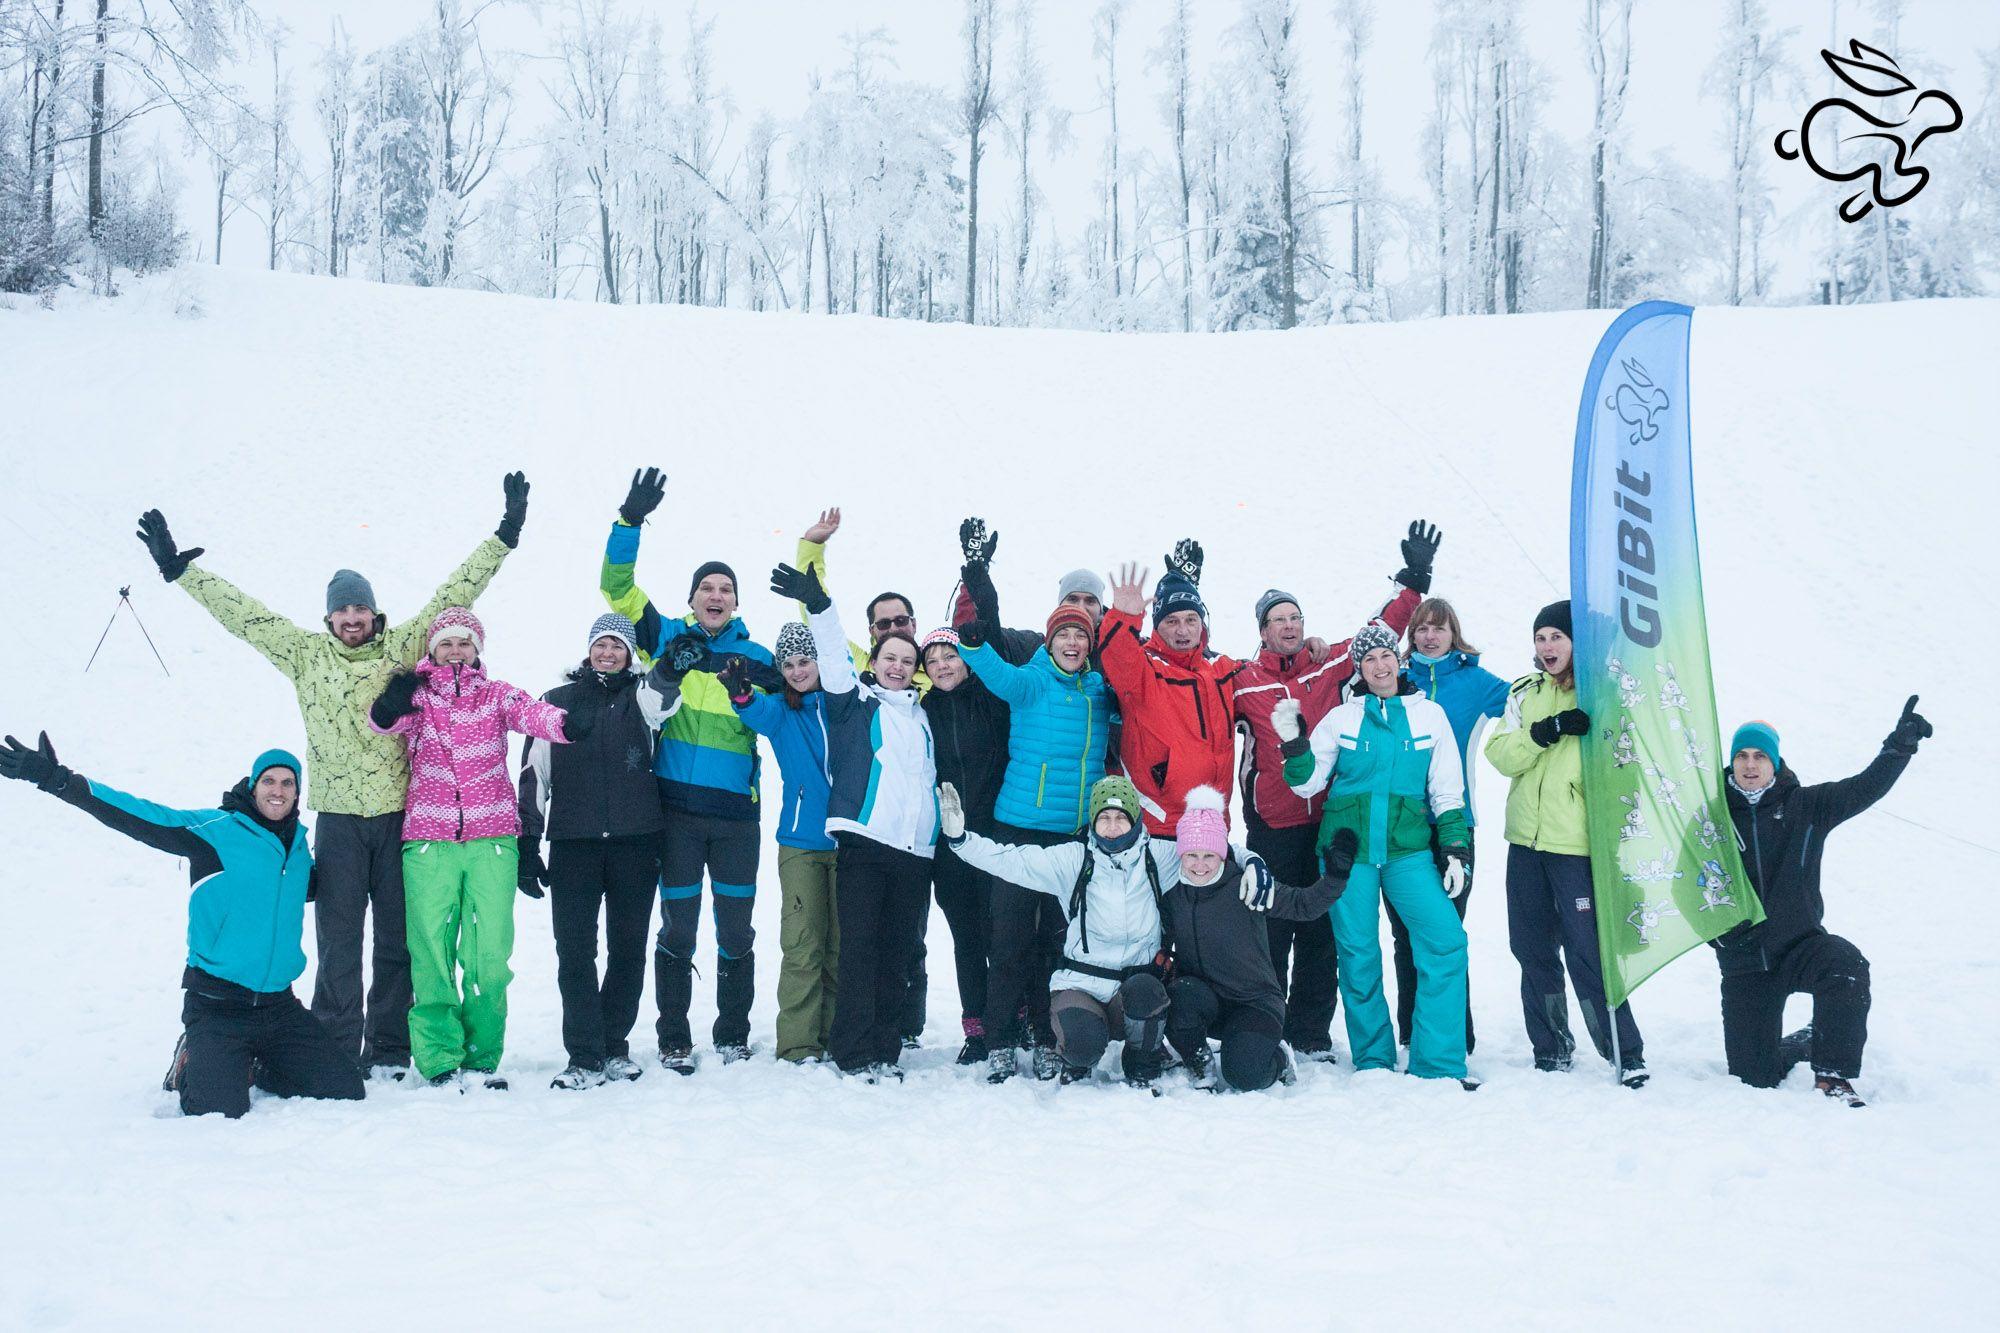 Bliža se zimski GiBit aktivni vikend. Prijave so odprte!